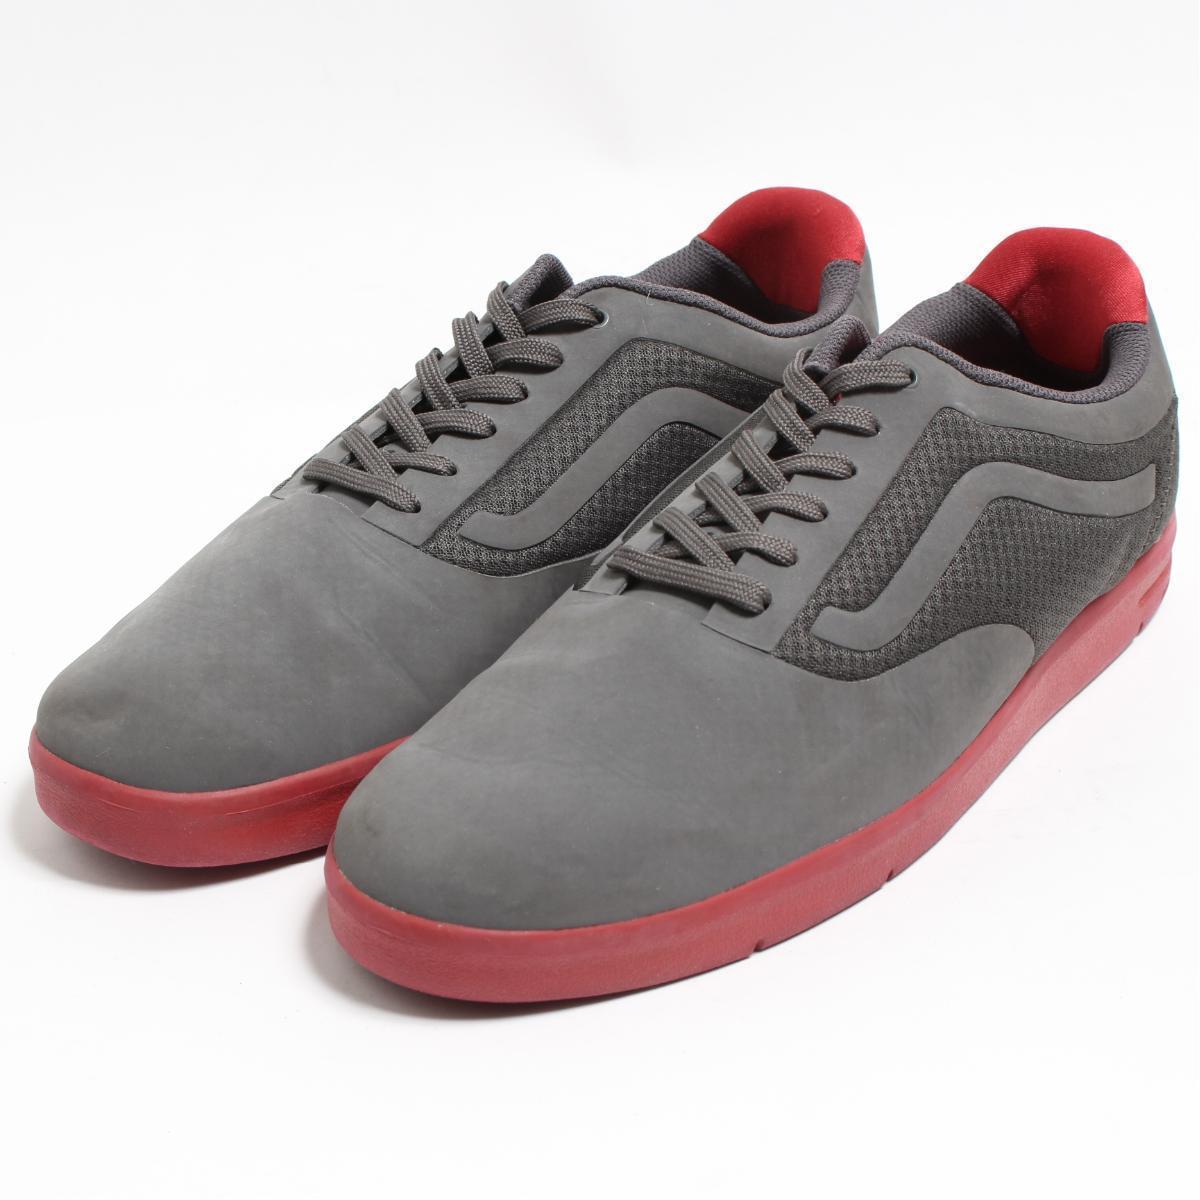 cd615f64a04763 VINTAGE CLOTHING JAM  Vans VANS Lxvi Graph sneakers US10 men 28.0cm ...